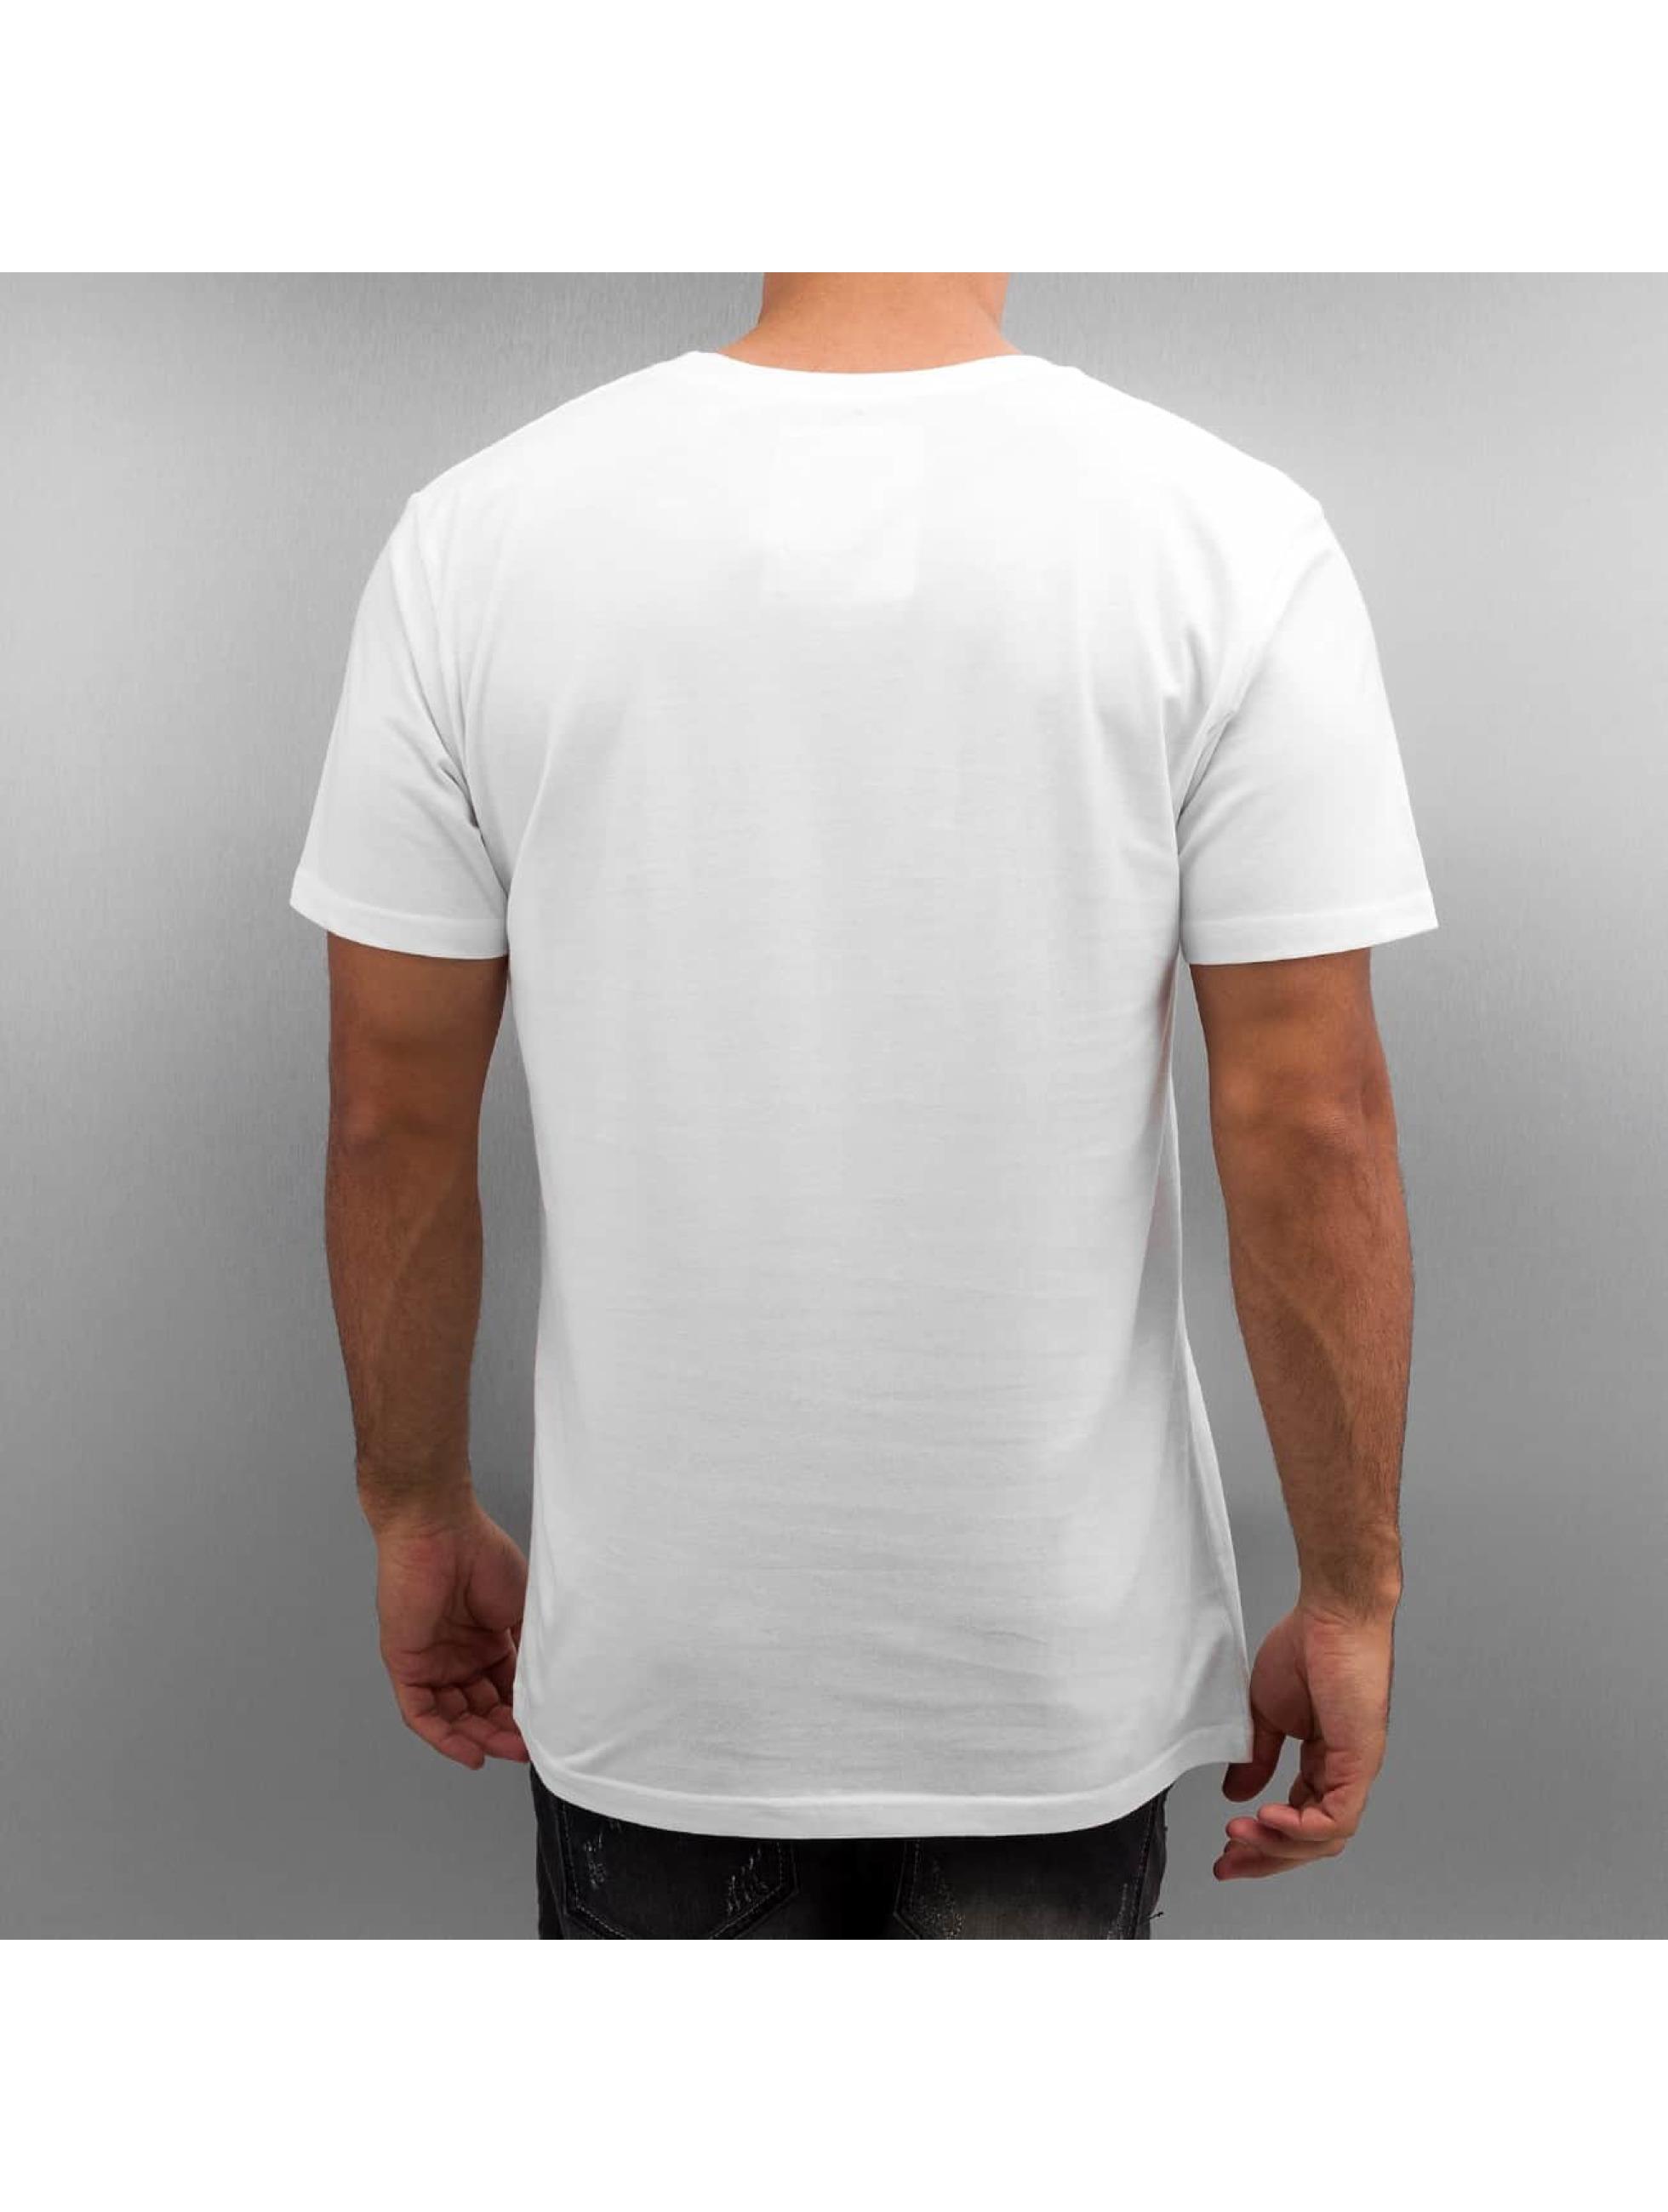 DEDICATED T-shirt Ricky Powell Eazy vit